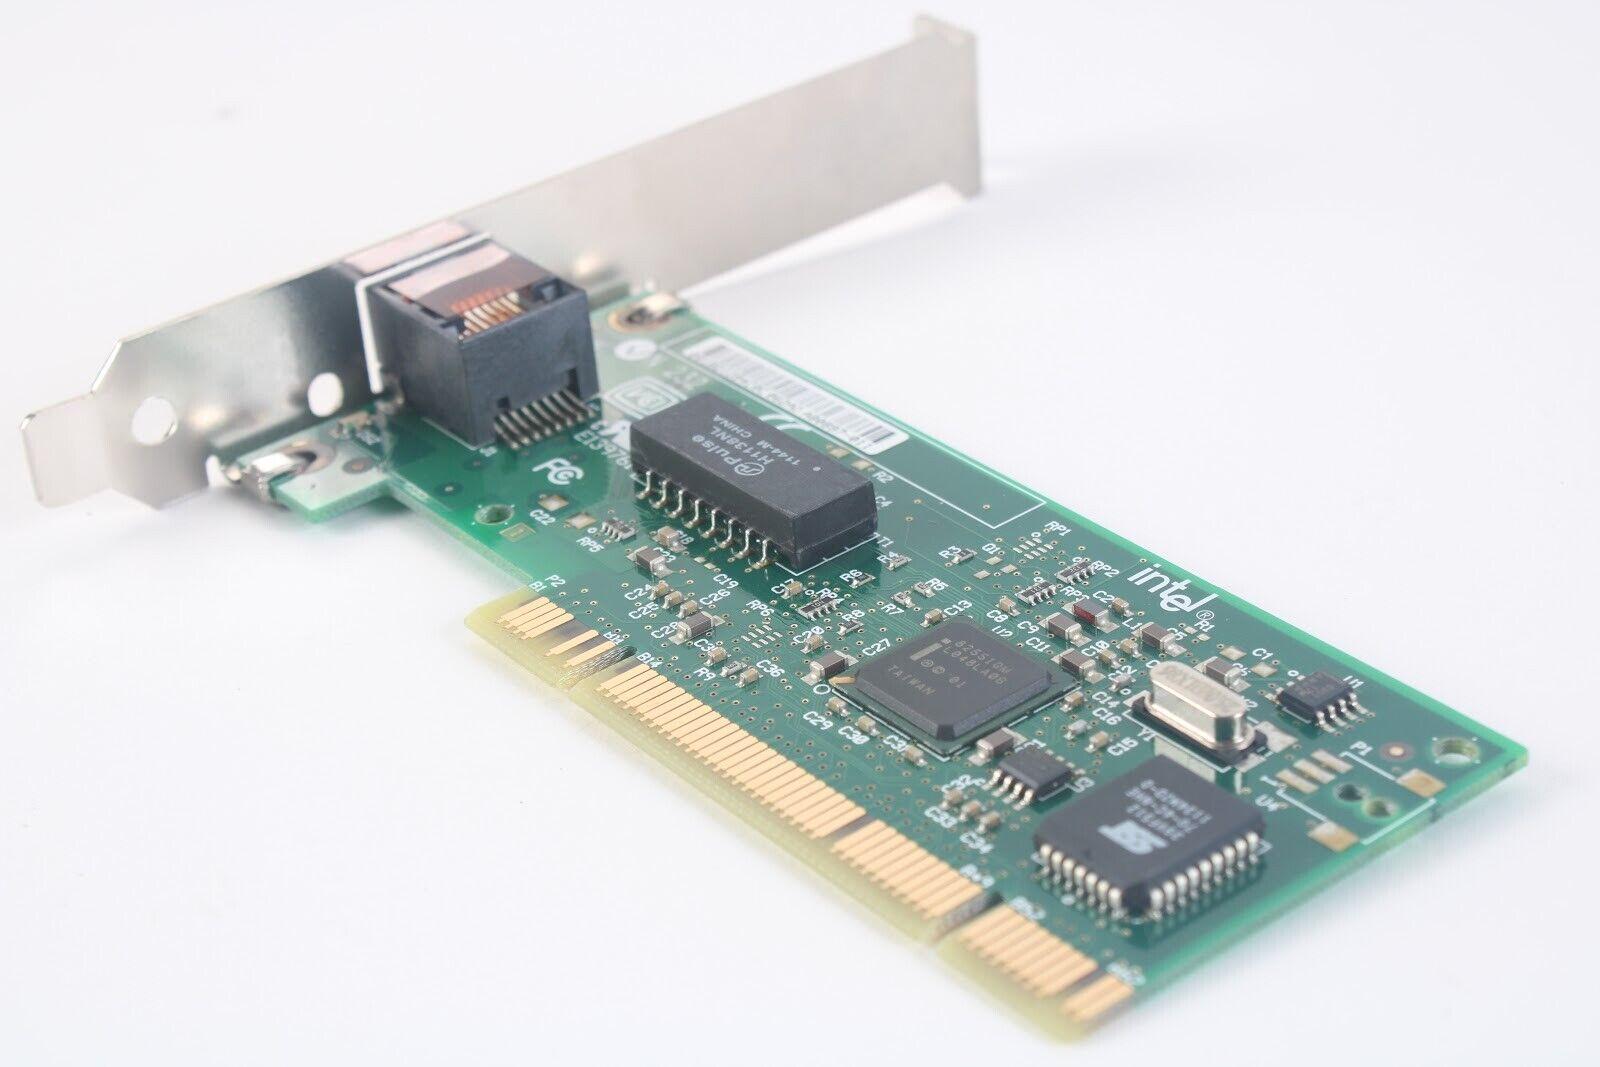 Intel pro/100 854613m desktop network adapter 8460m stack 735858162302